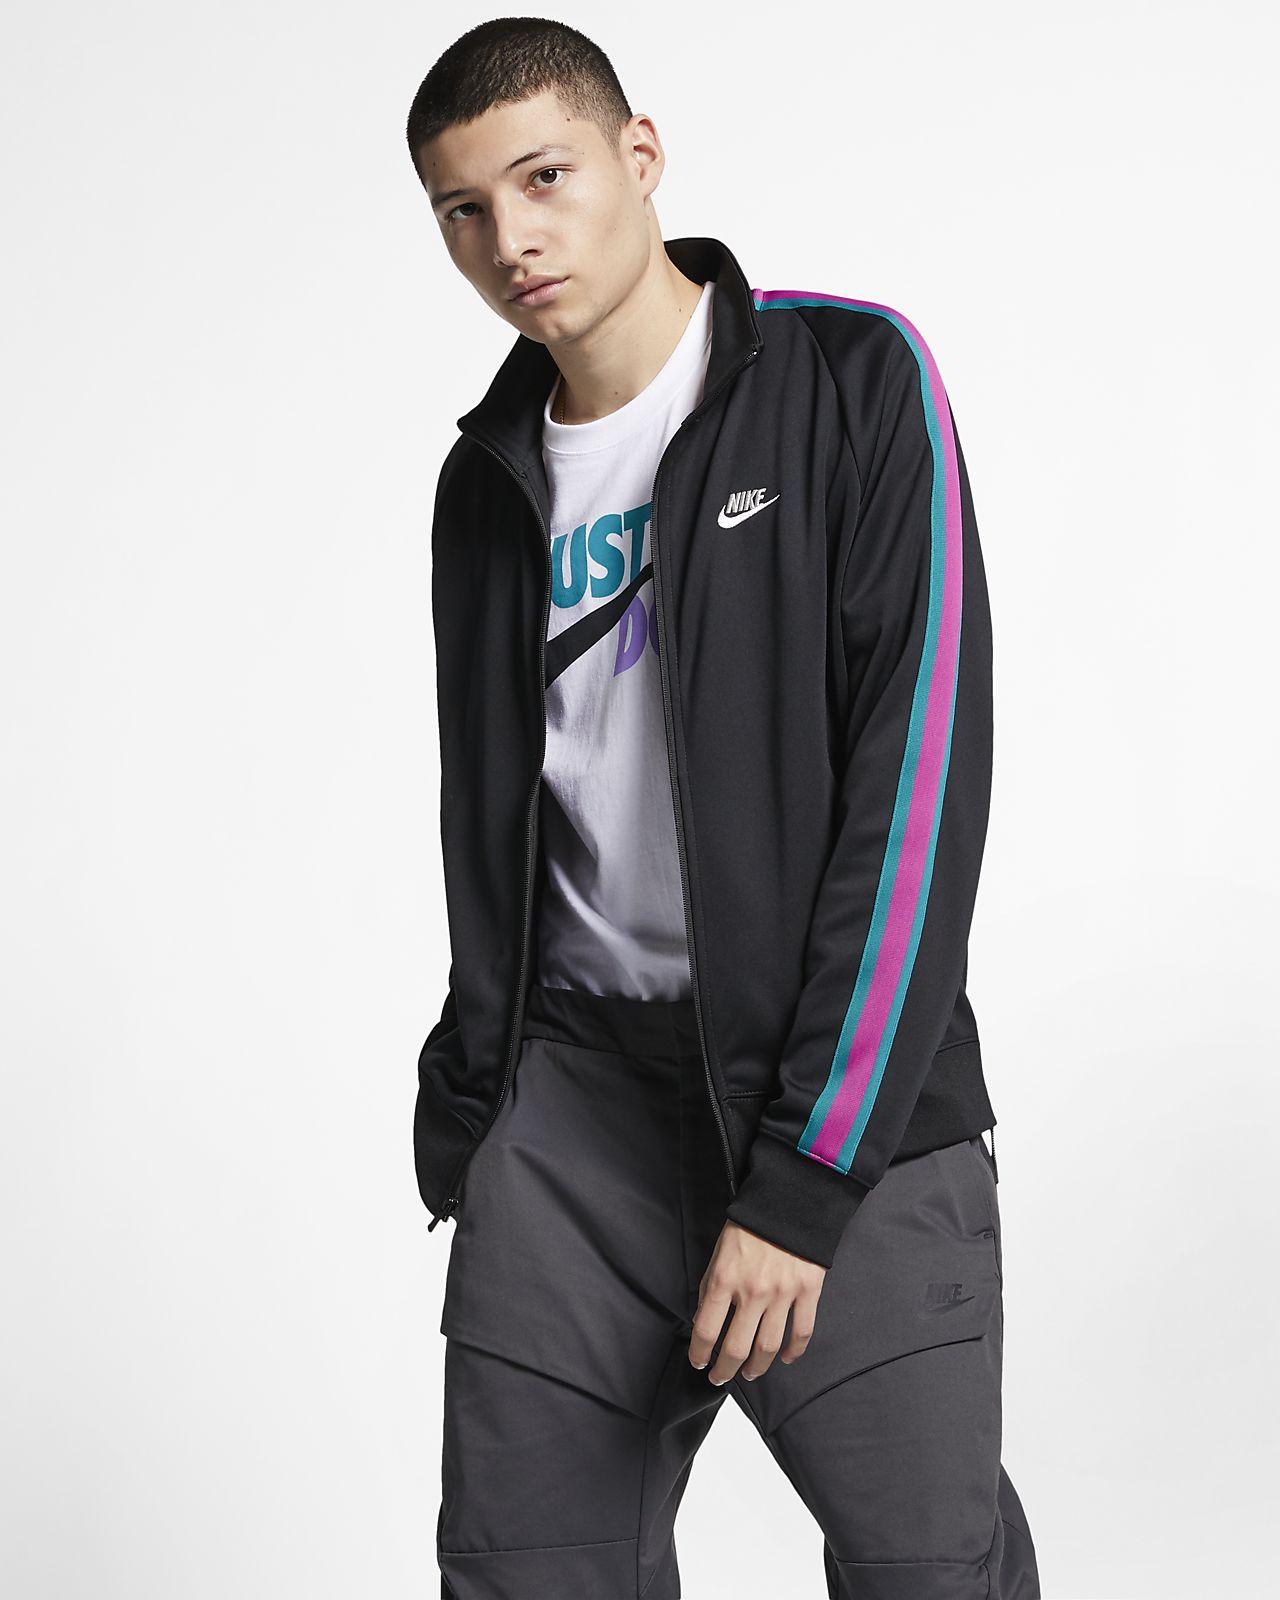 8fff40b45861 Nike Sportswear N98 Men s Knit Warm-Up Jacket. Nike.com ZA